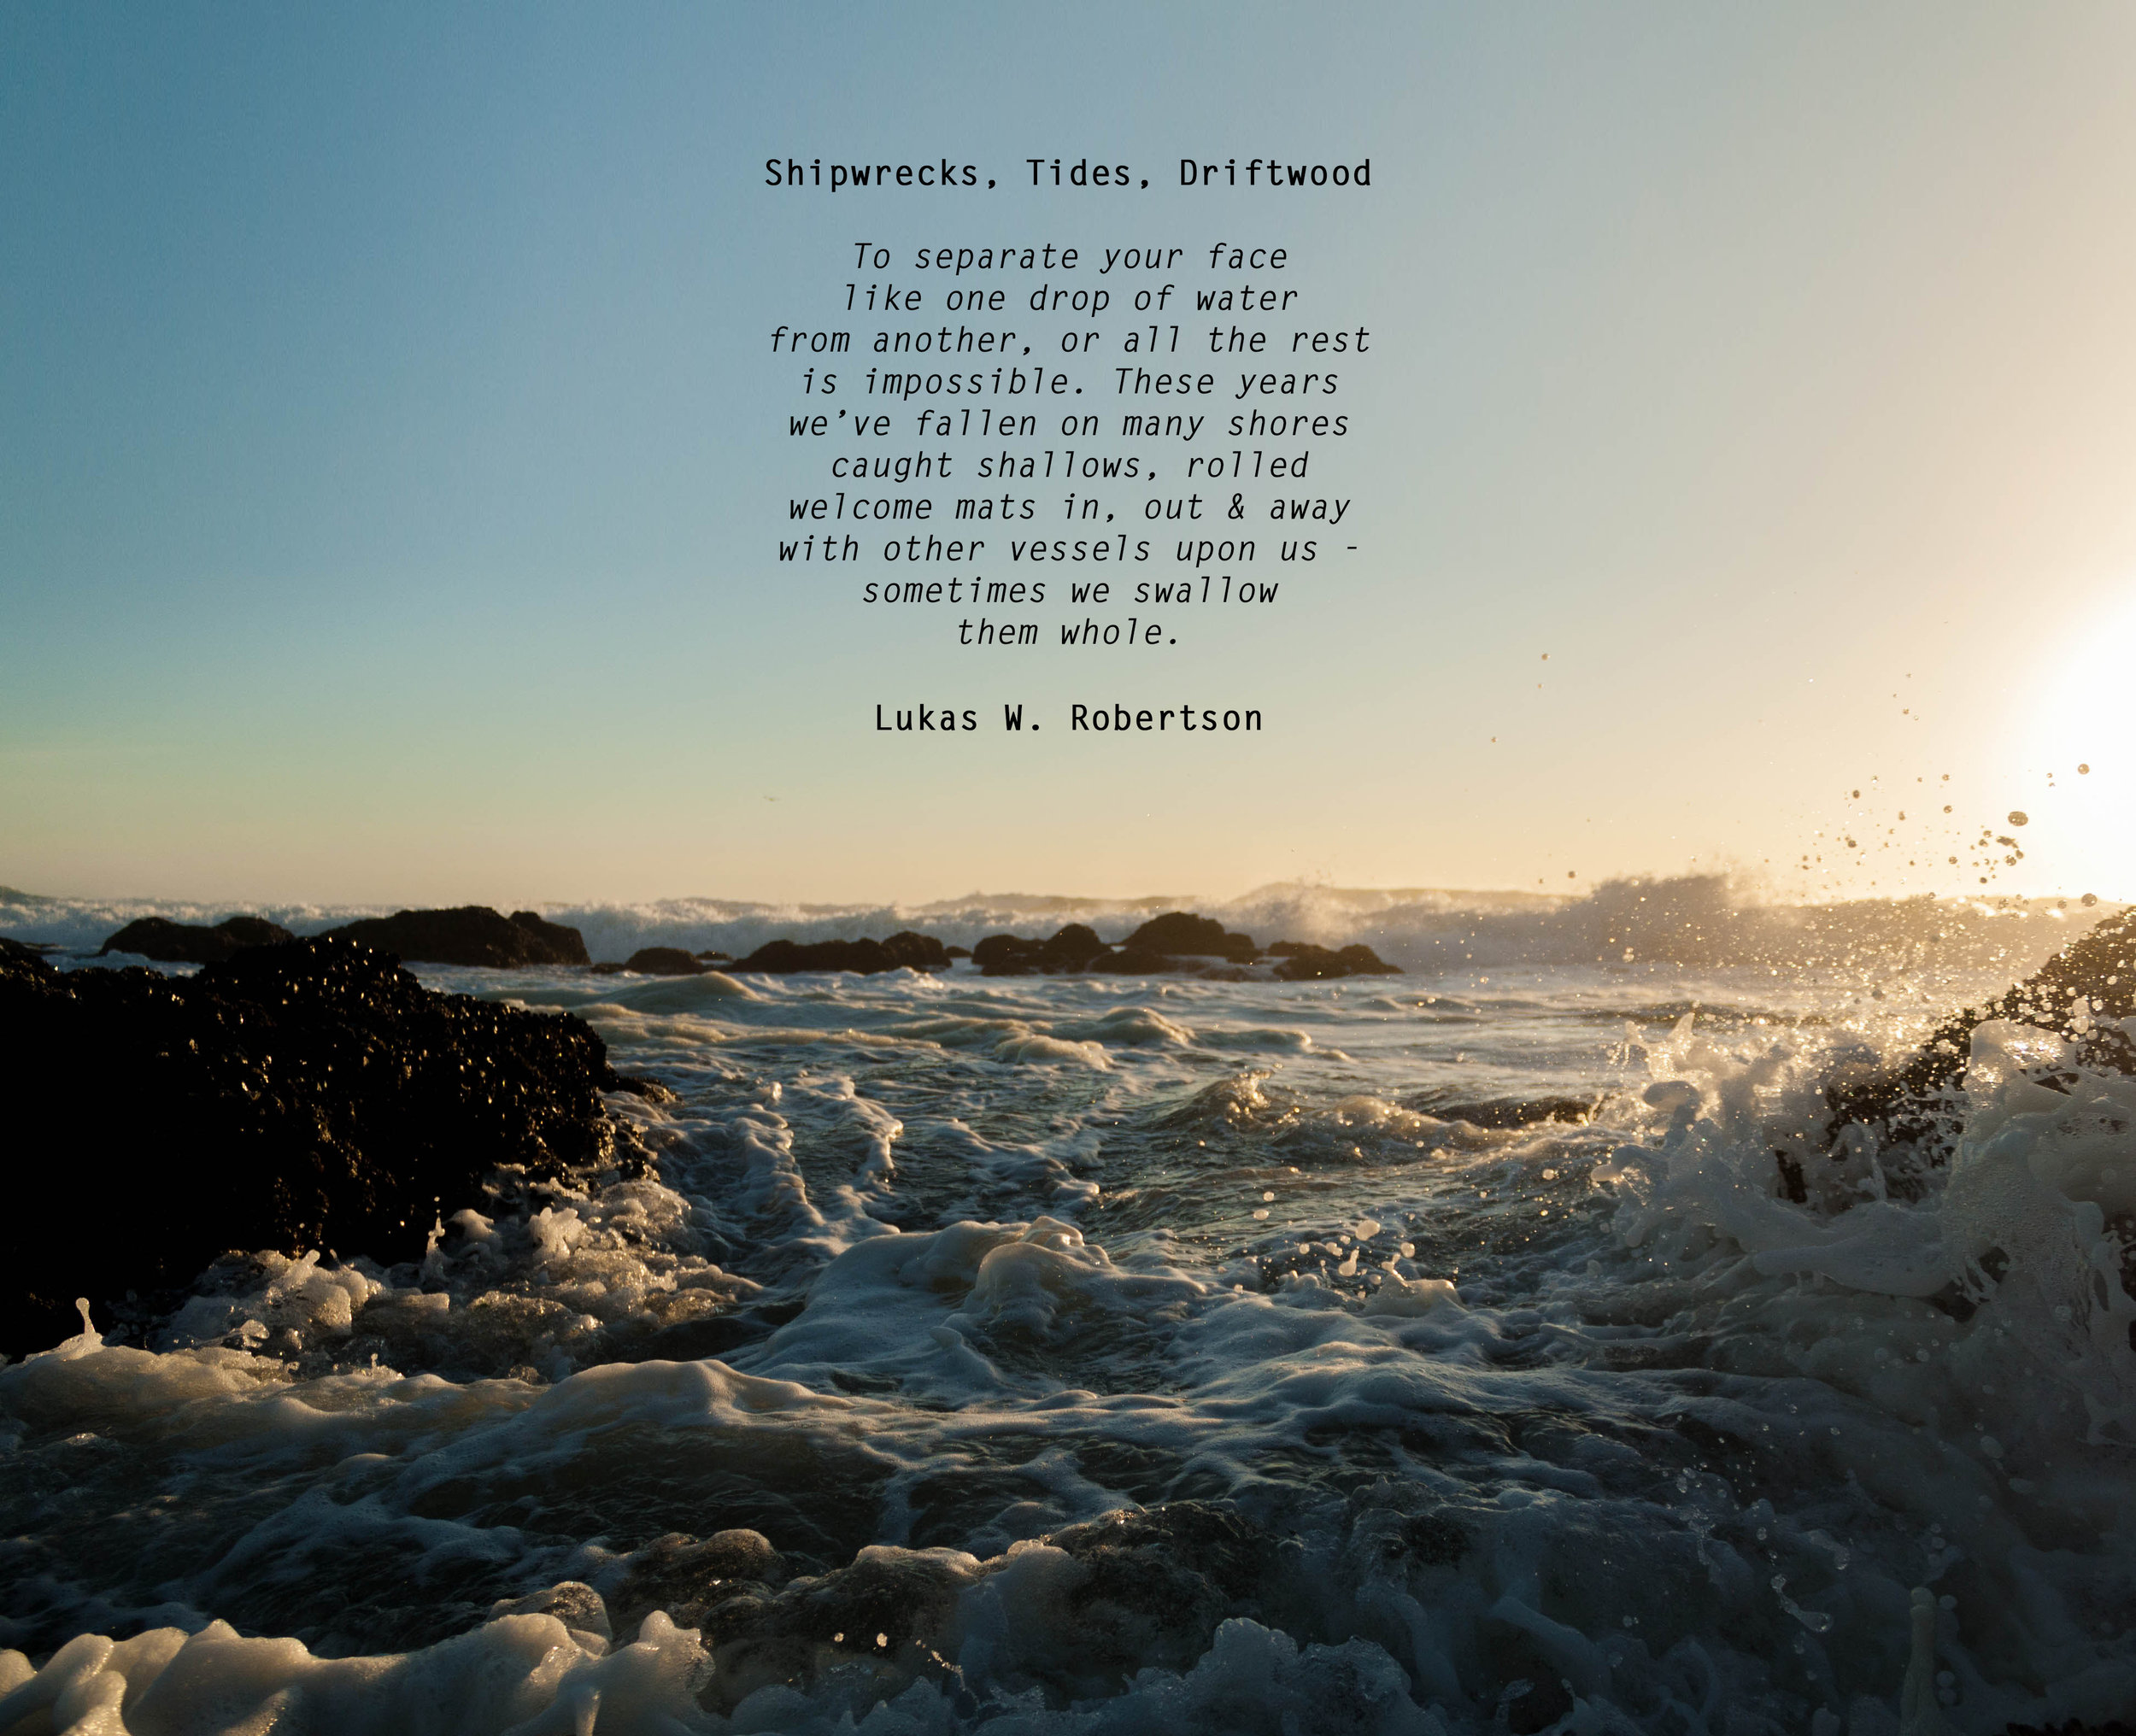 Shipwrecks, Tides, Driftwood